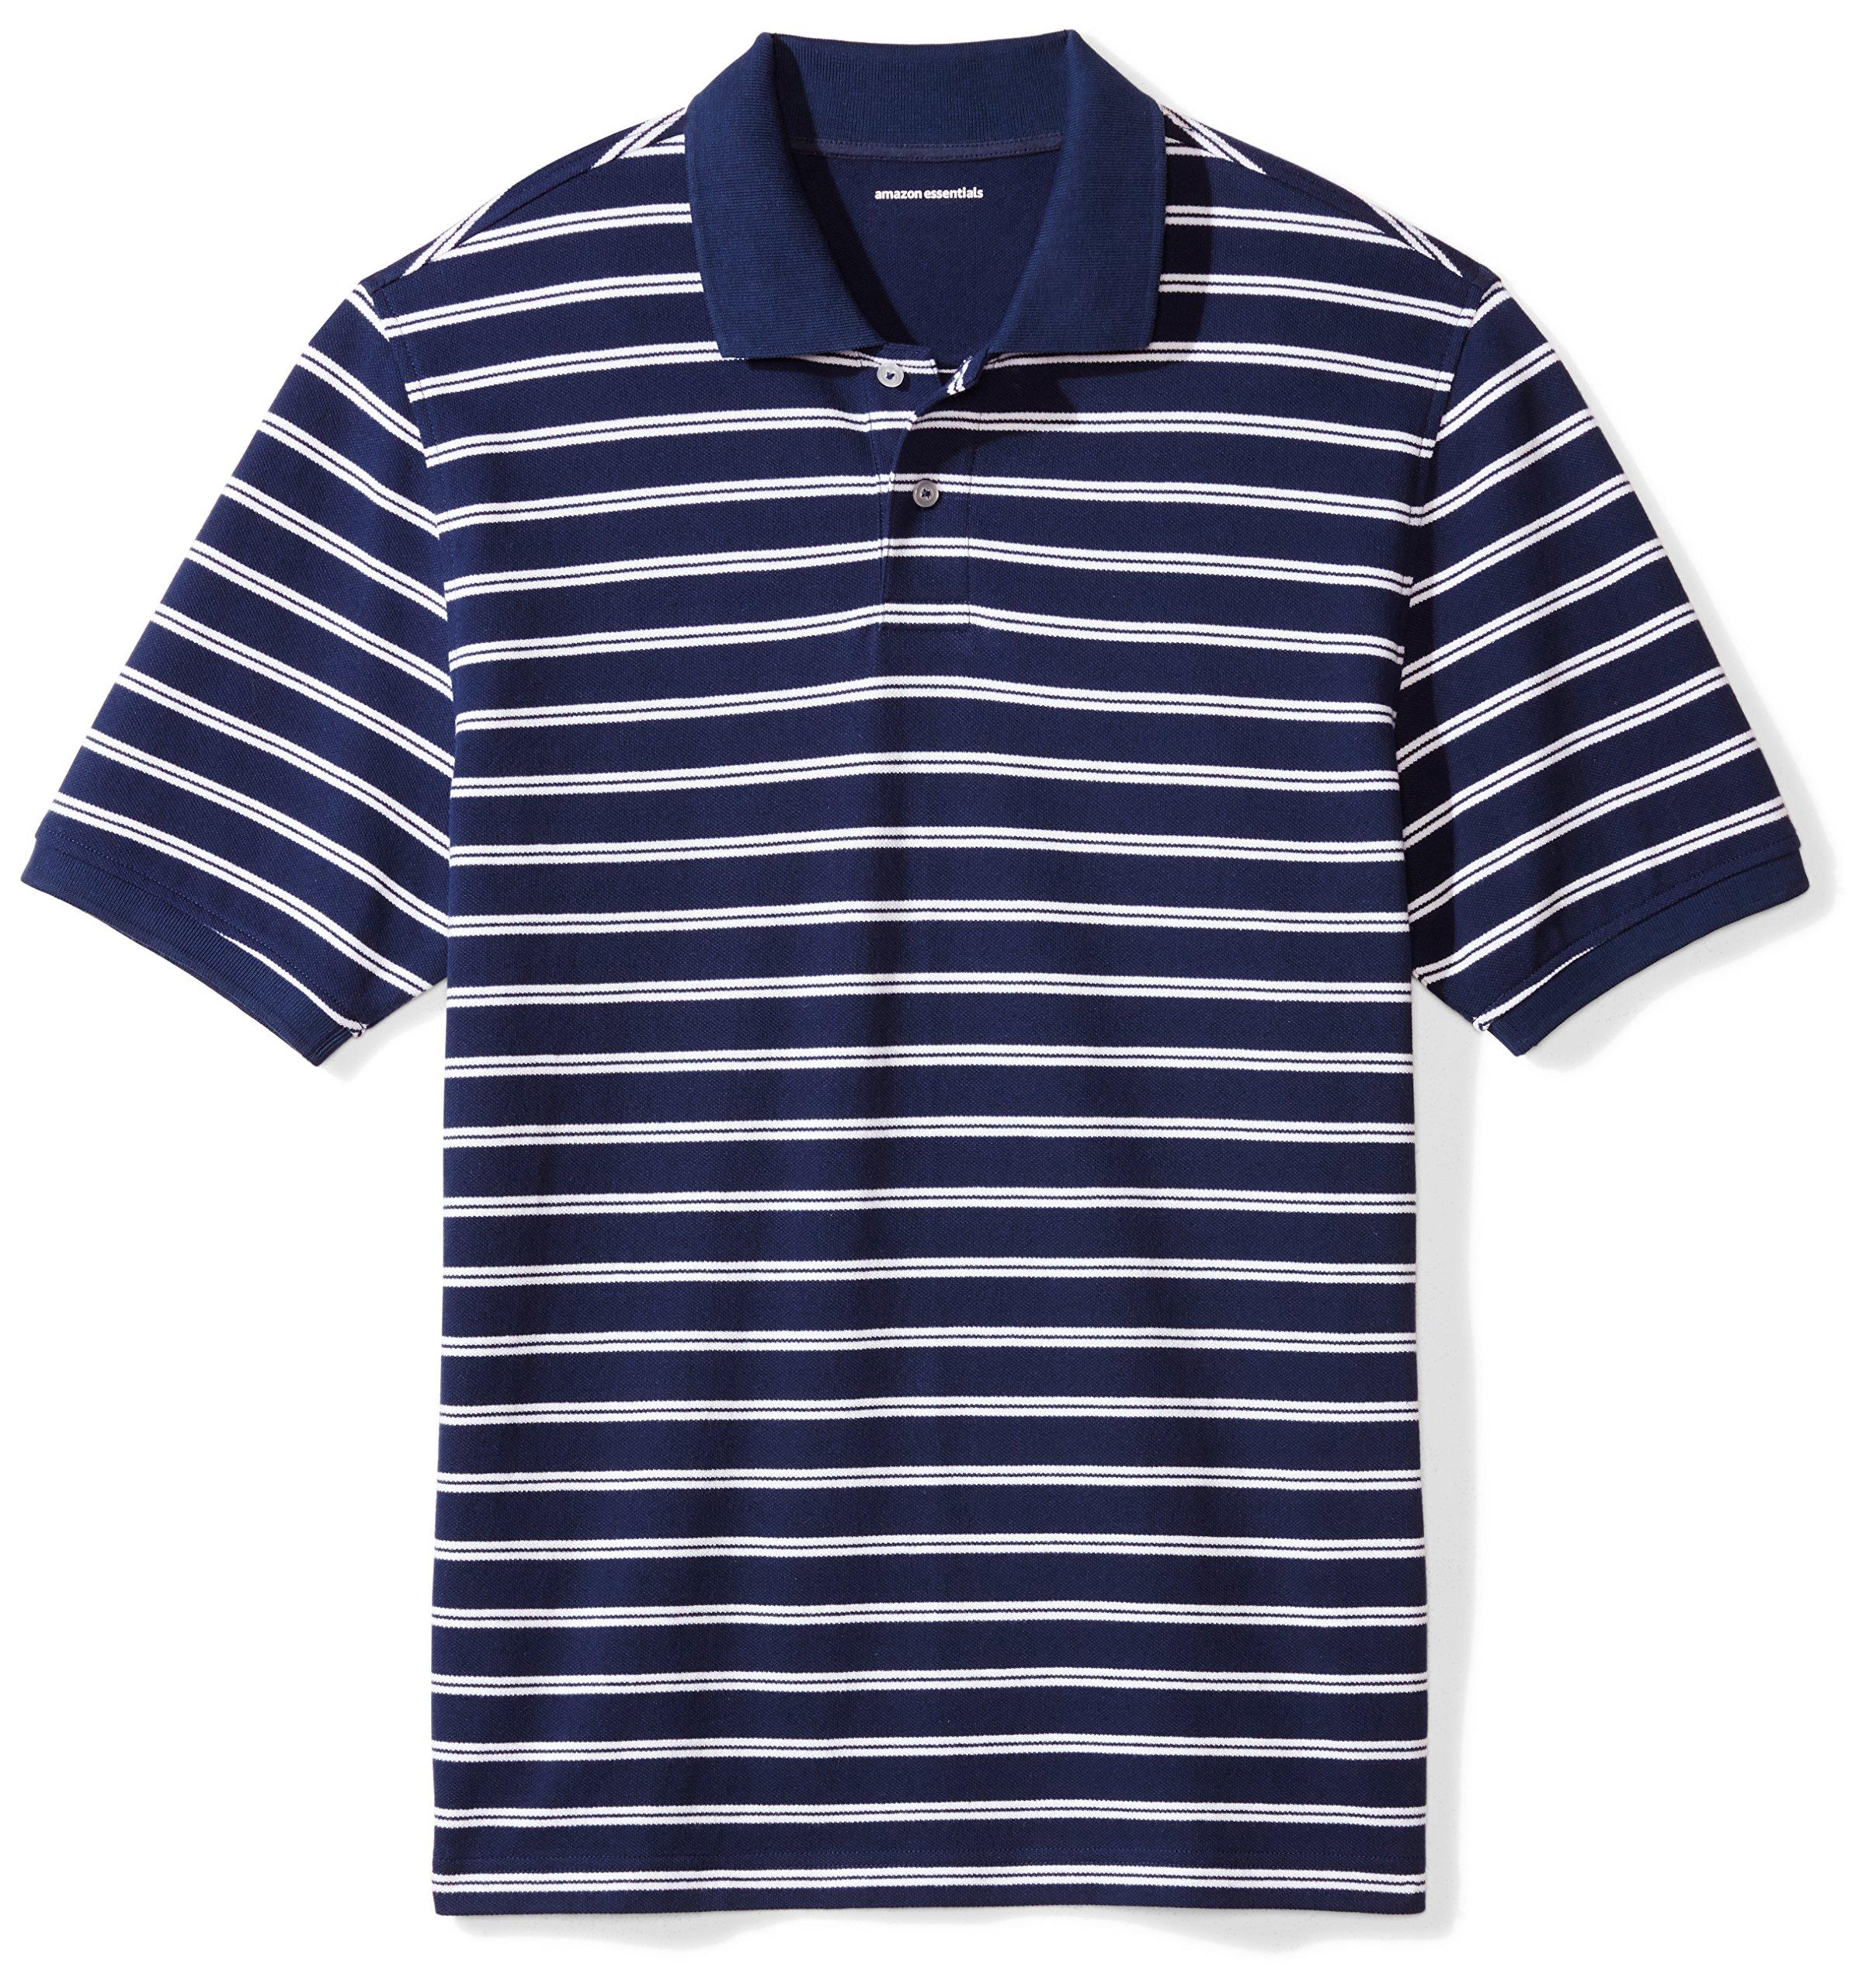 Amazon Essentials Men's Regular-Fit Striped Cotton Pique Polo Shirt, Navy/White Stripe, X-Large